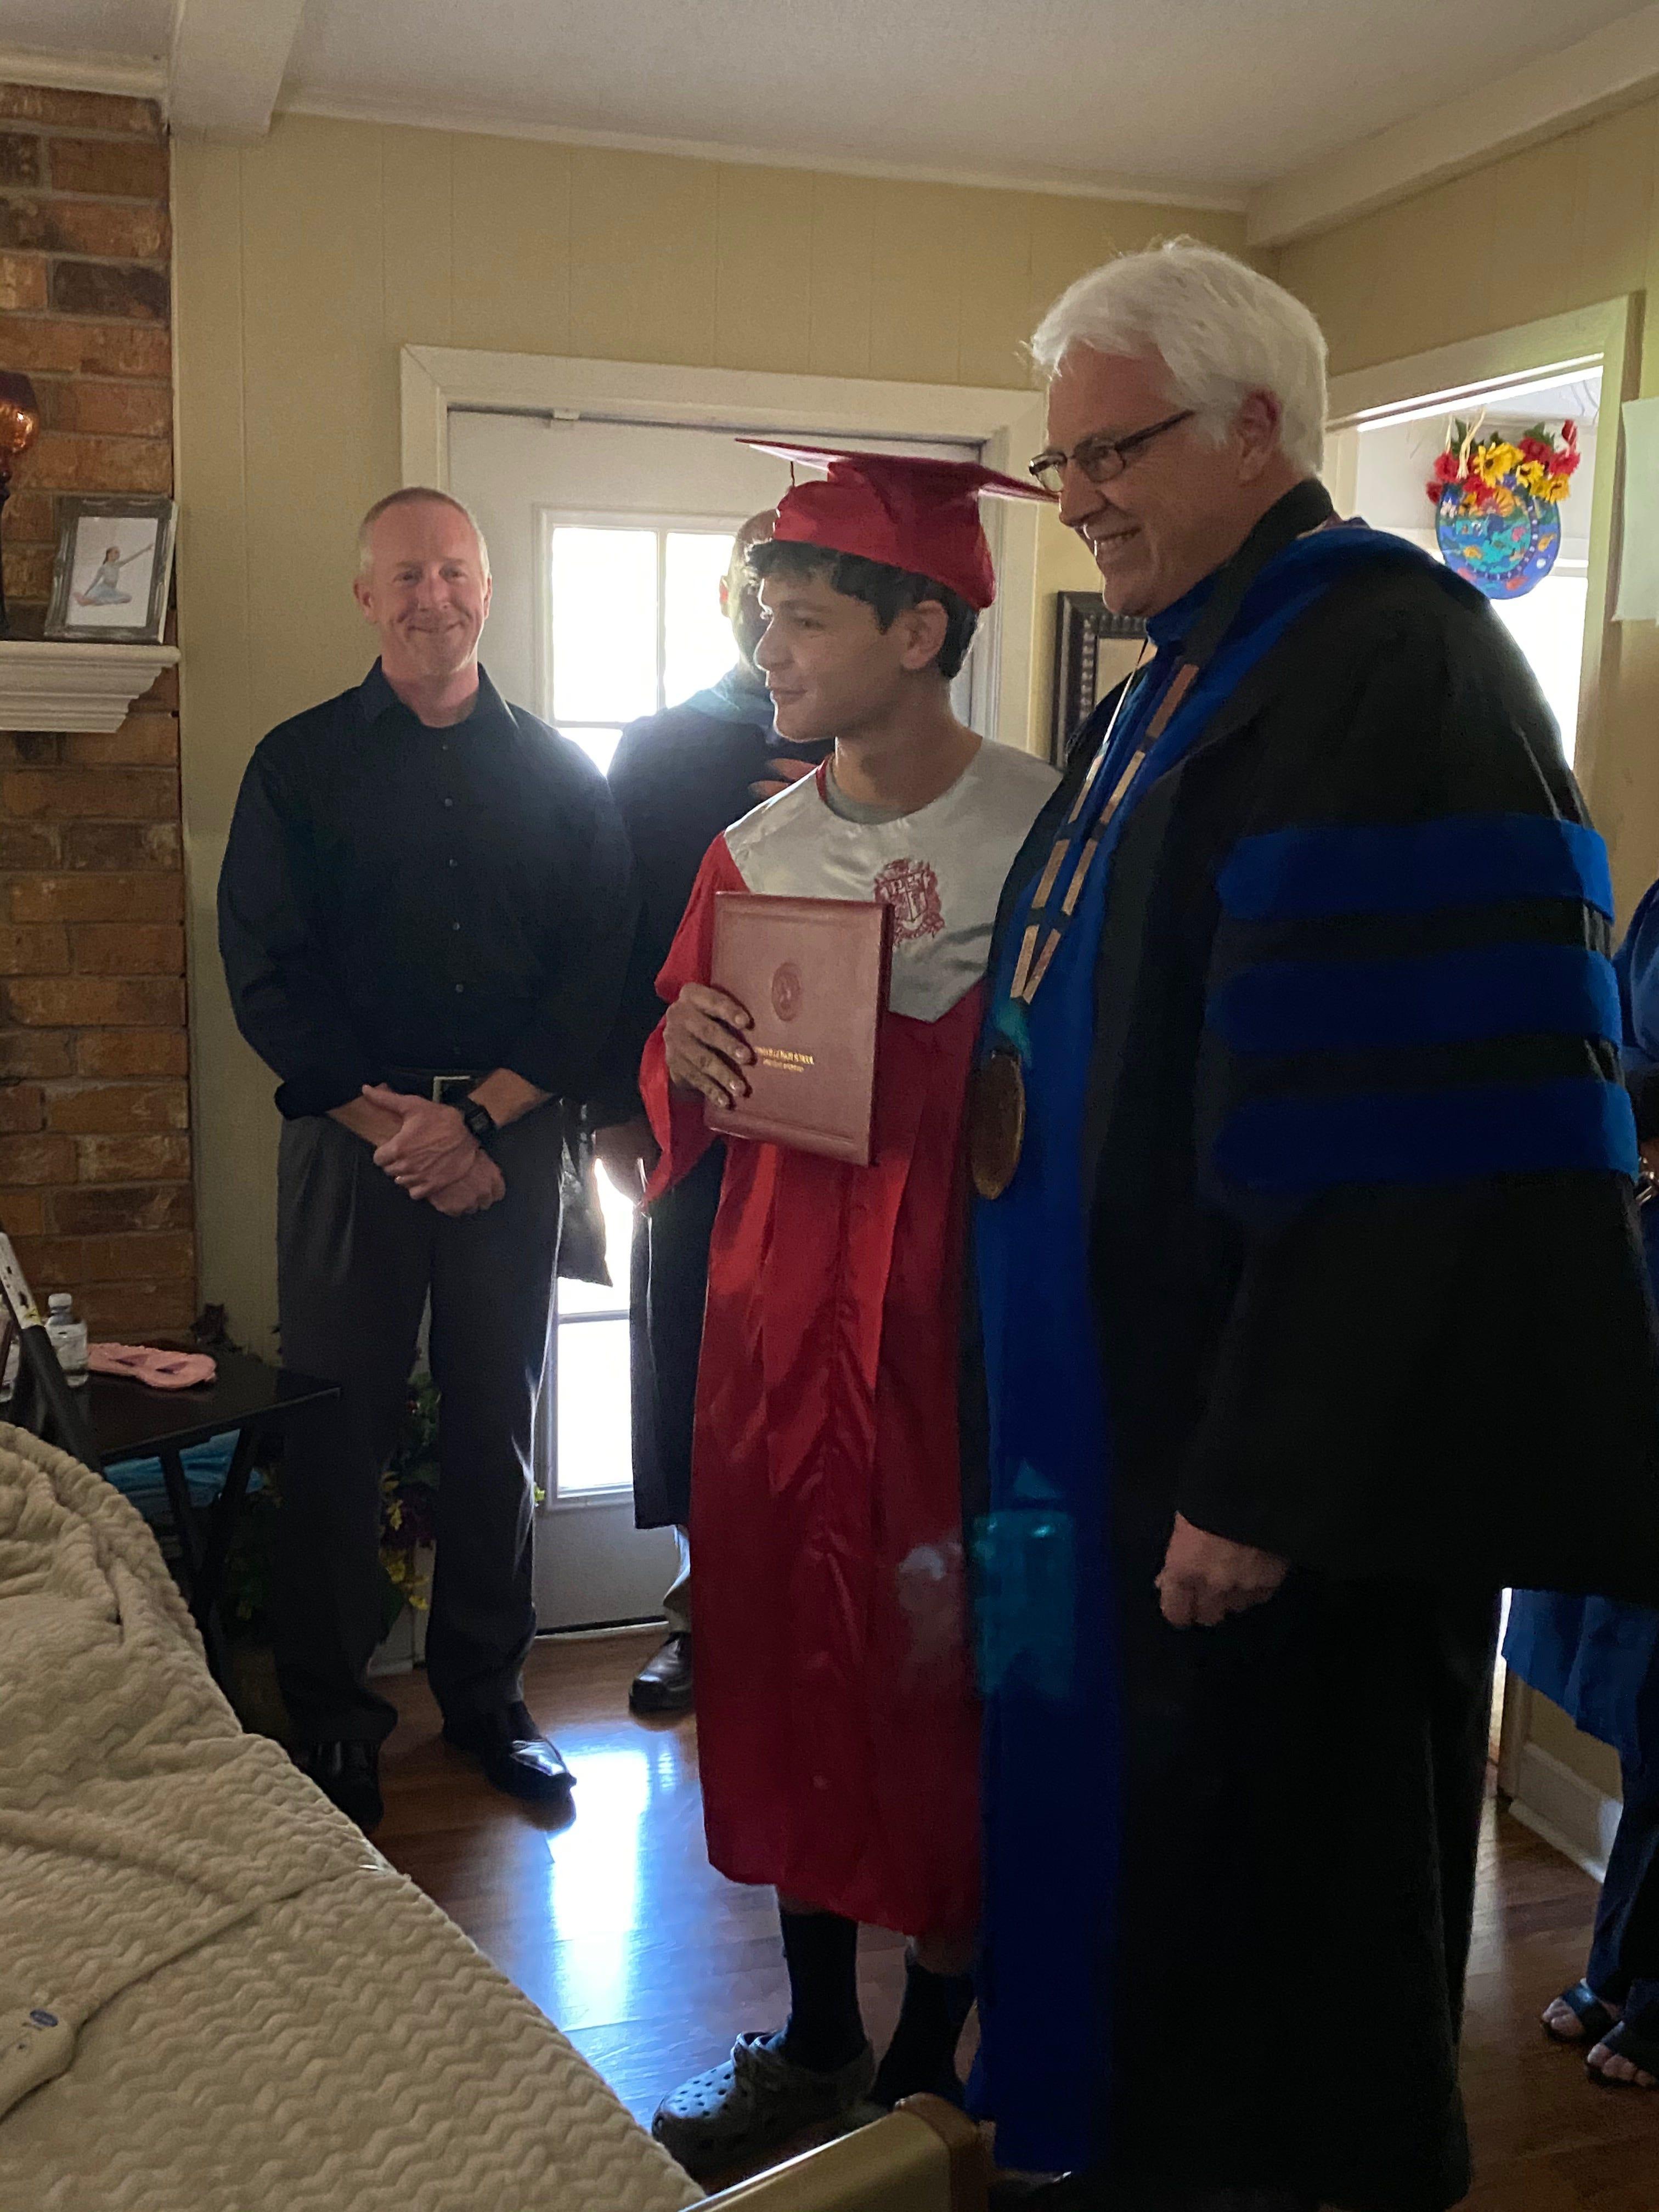 She got her wish : Louisiana high school helps terminally ill mom see son graduate